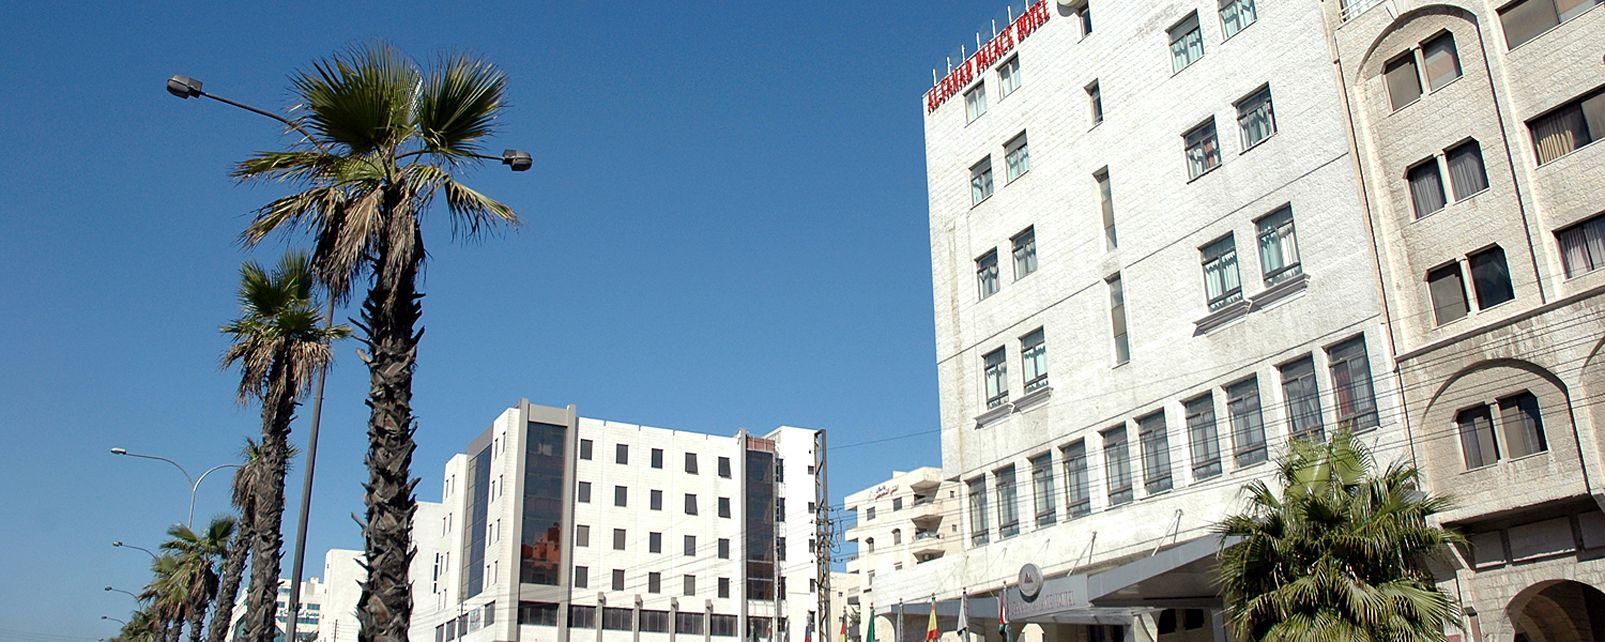 Hôtel Al Fanar Palace